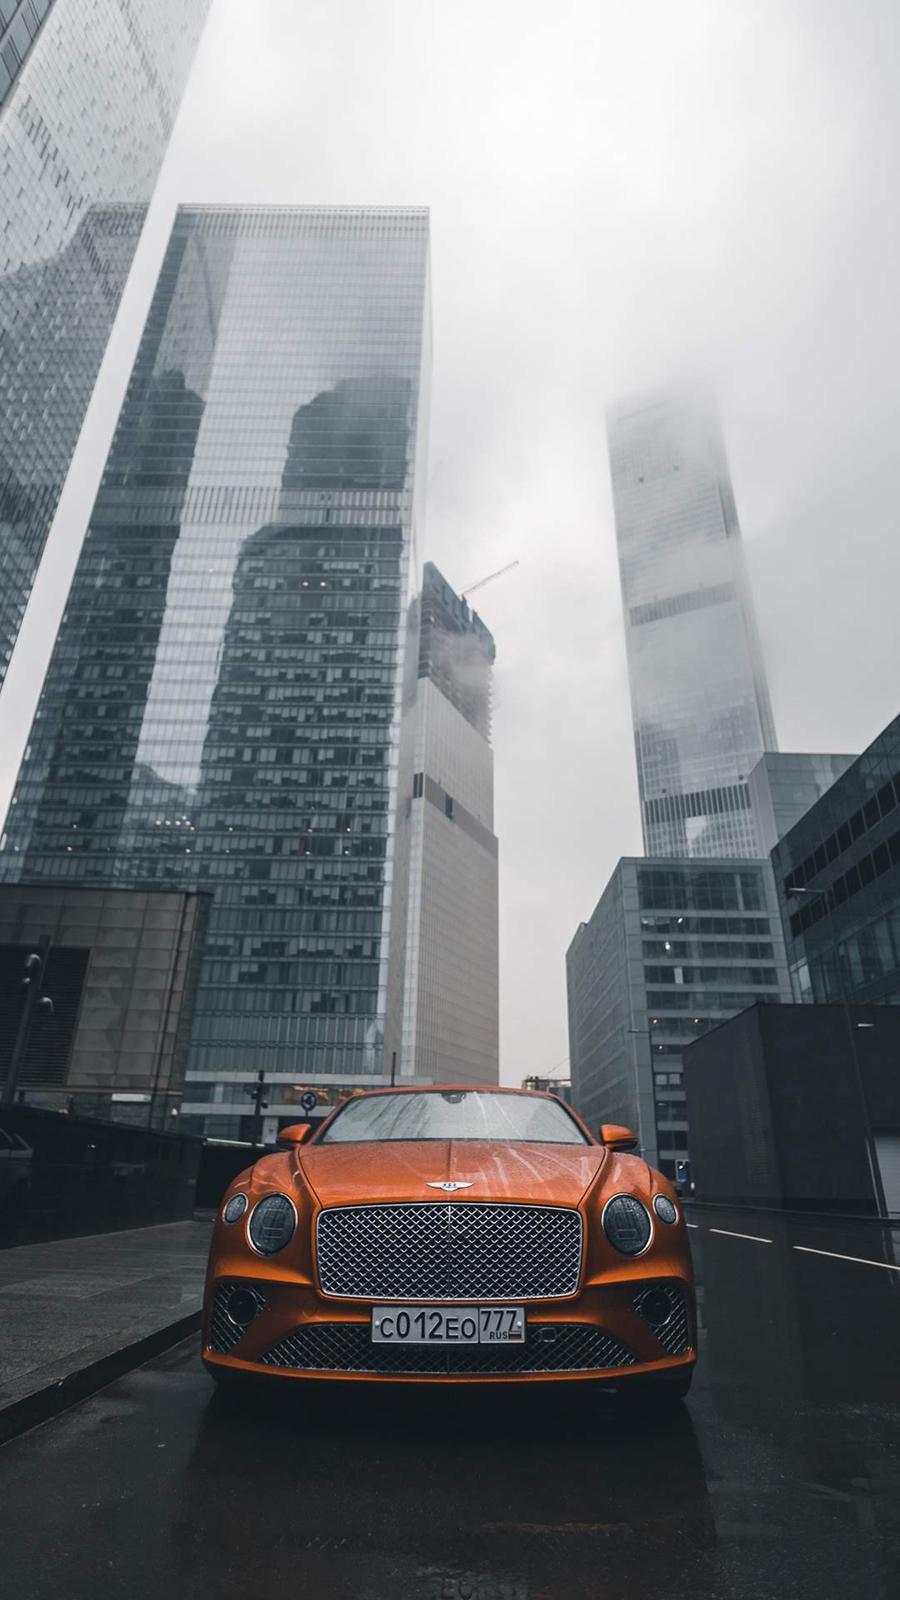 Orange Luxury Car Wallpapers Free Download